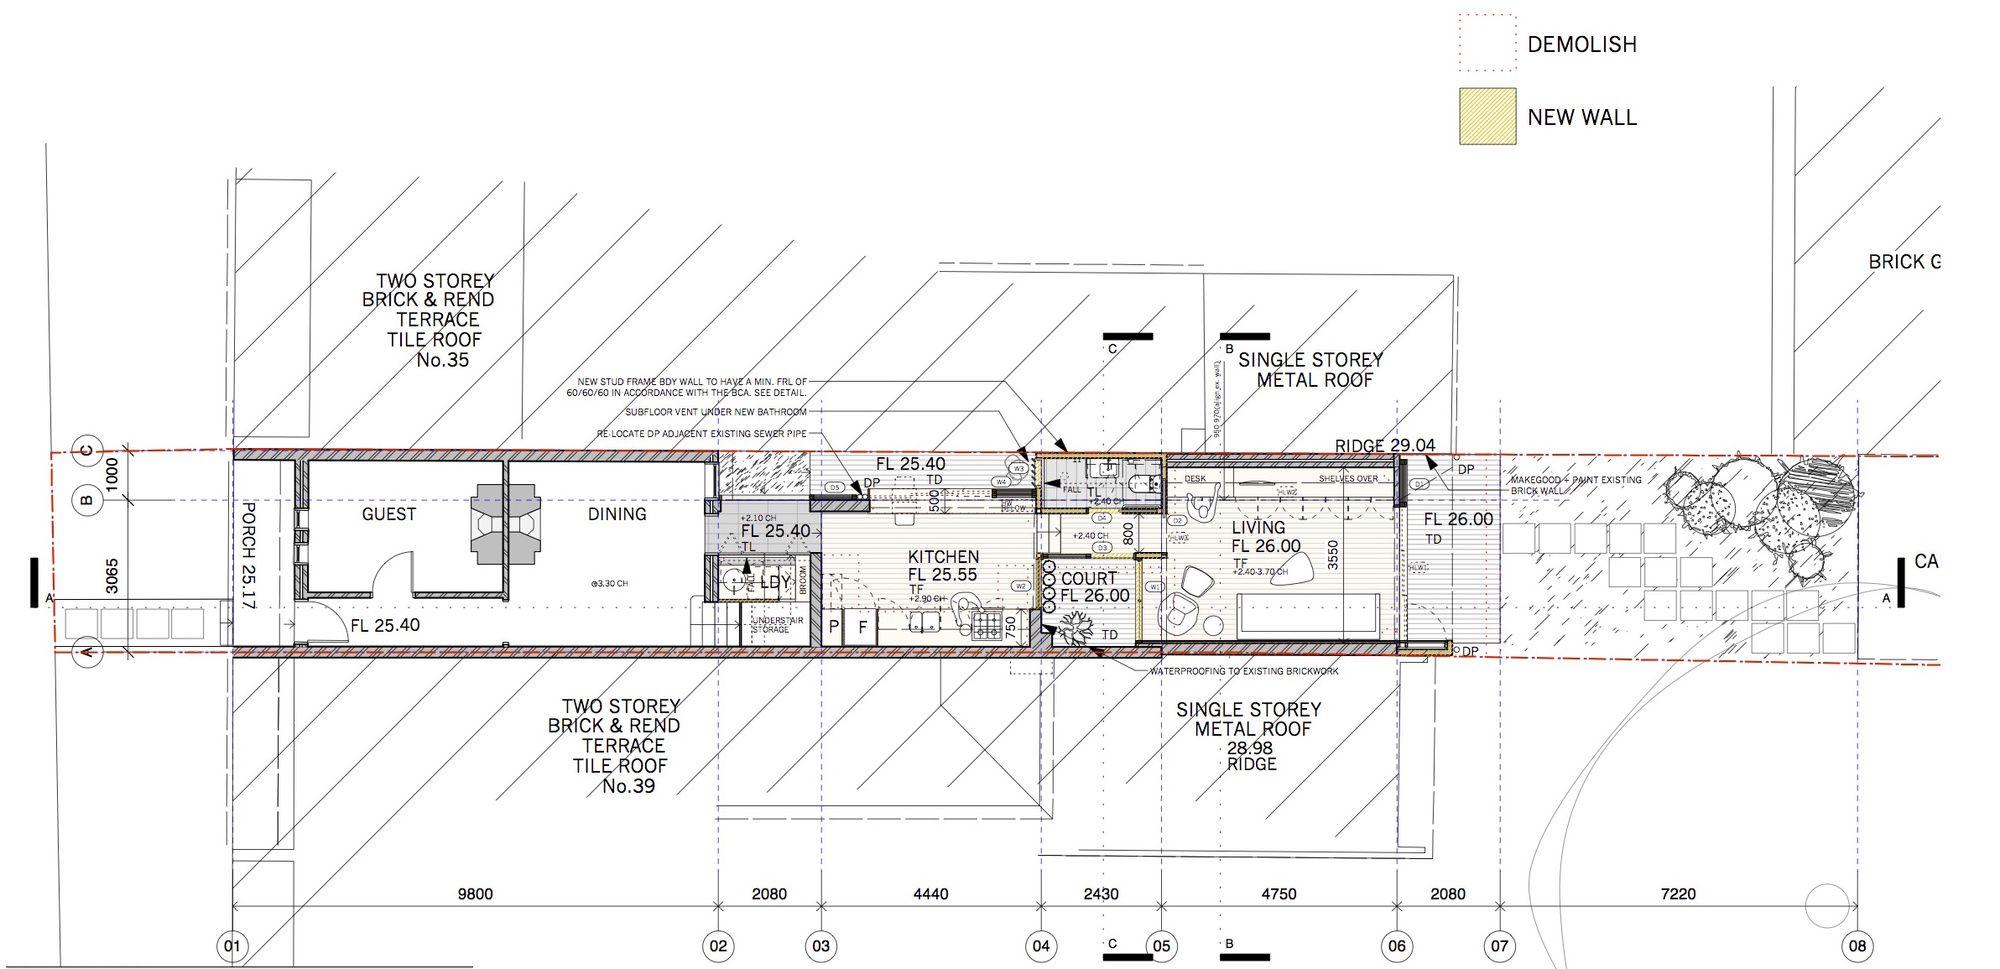 narrow sydney terrace sydney architect - Google Search | Terrace ...